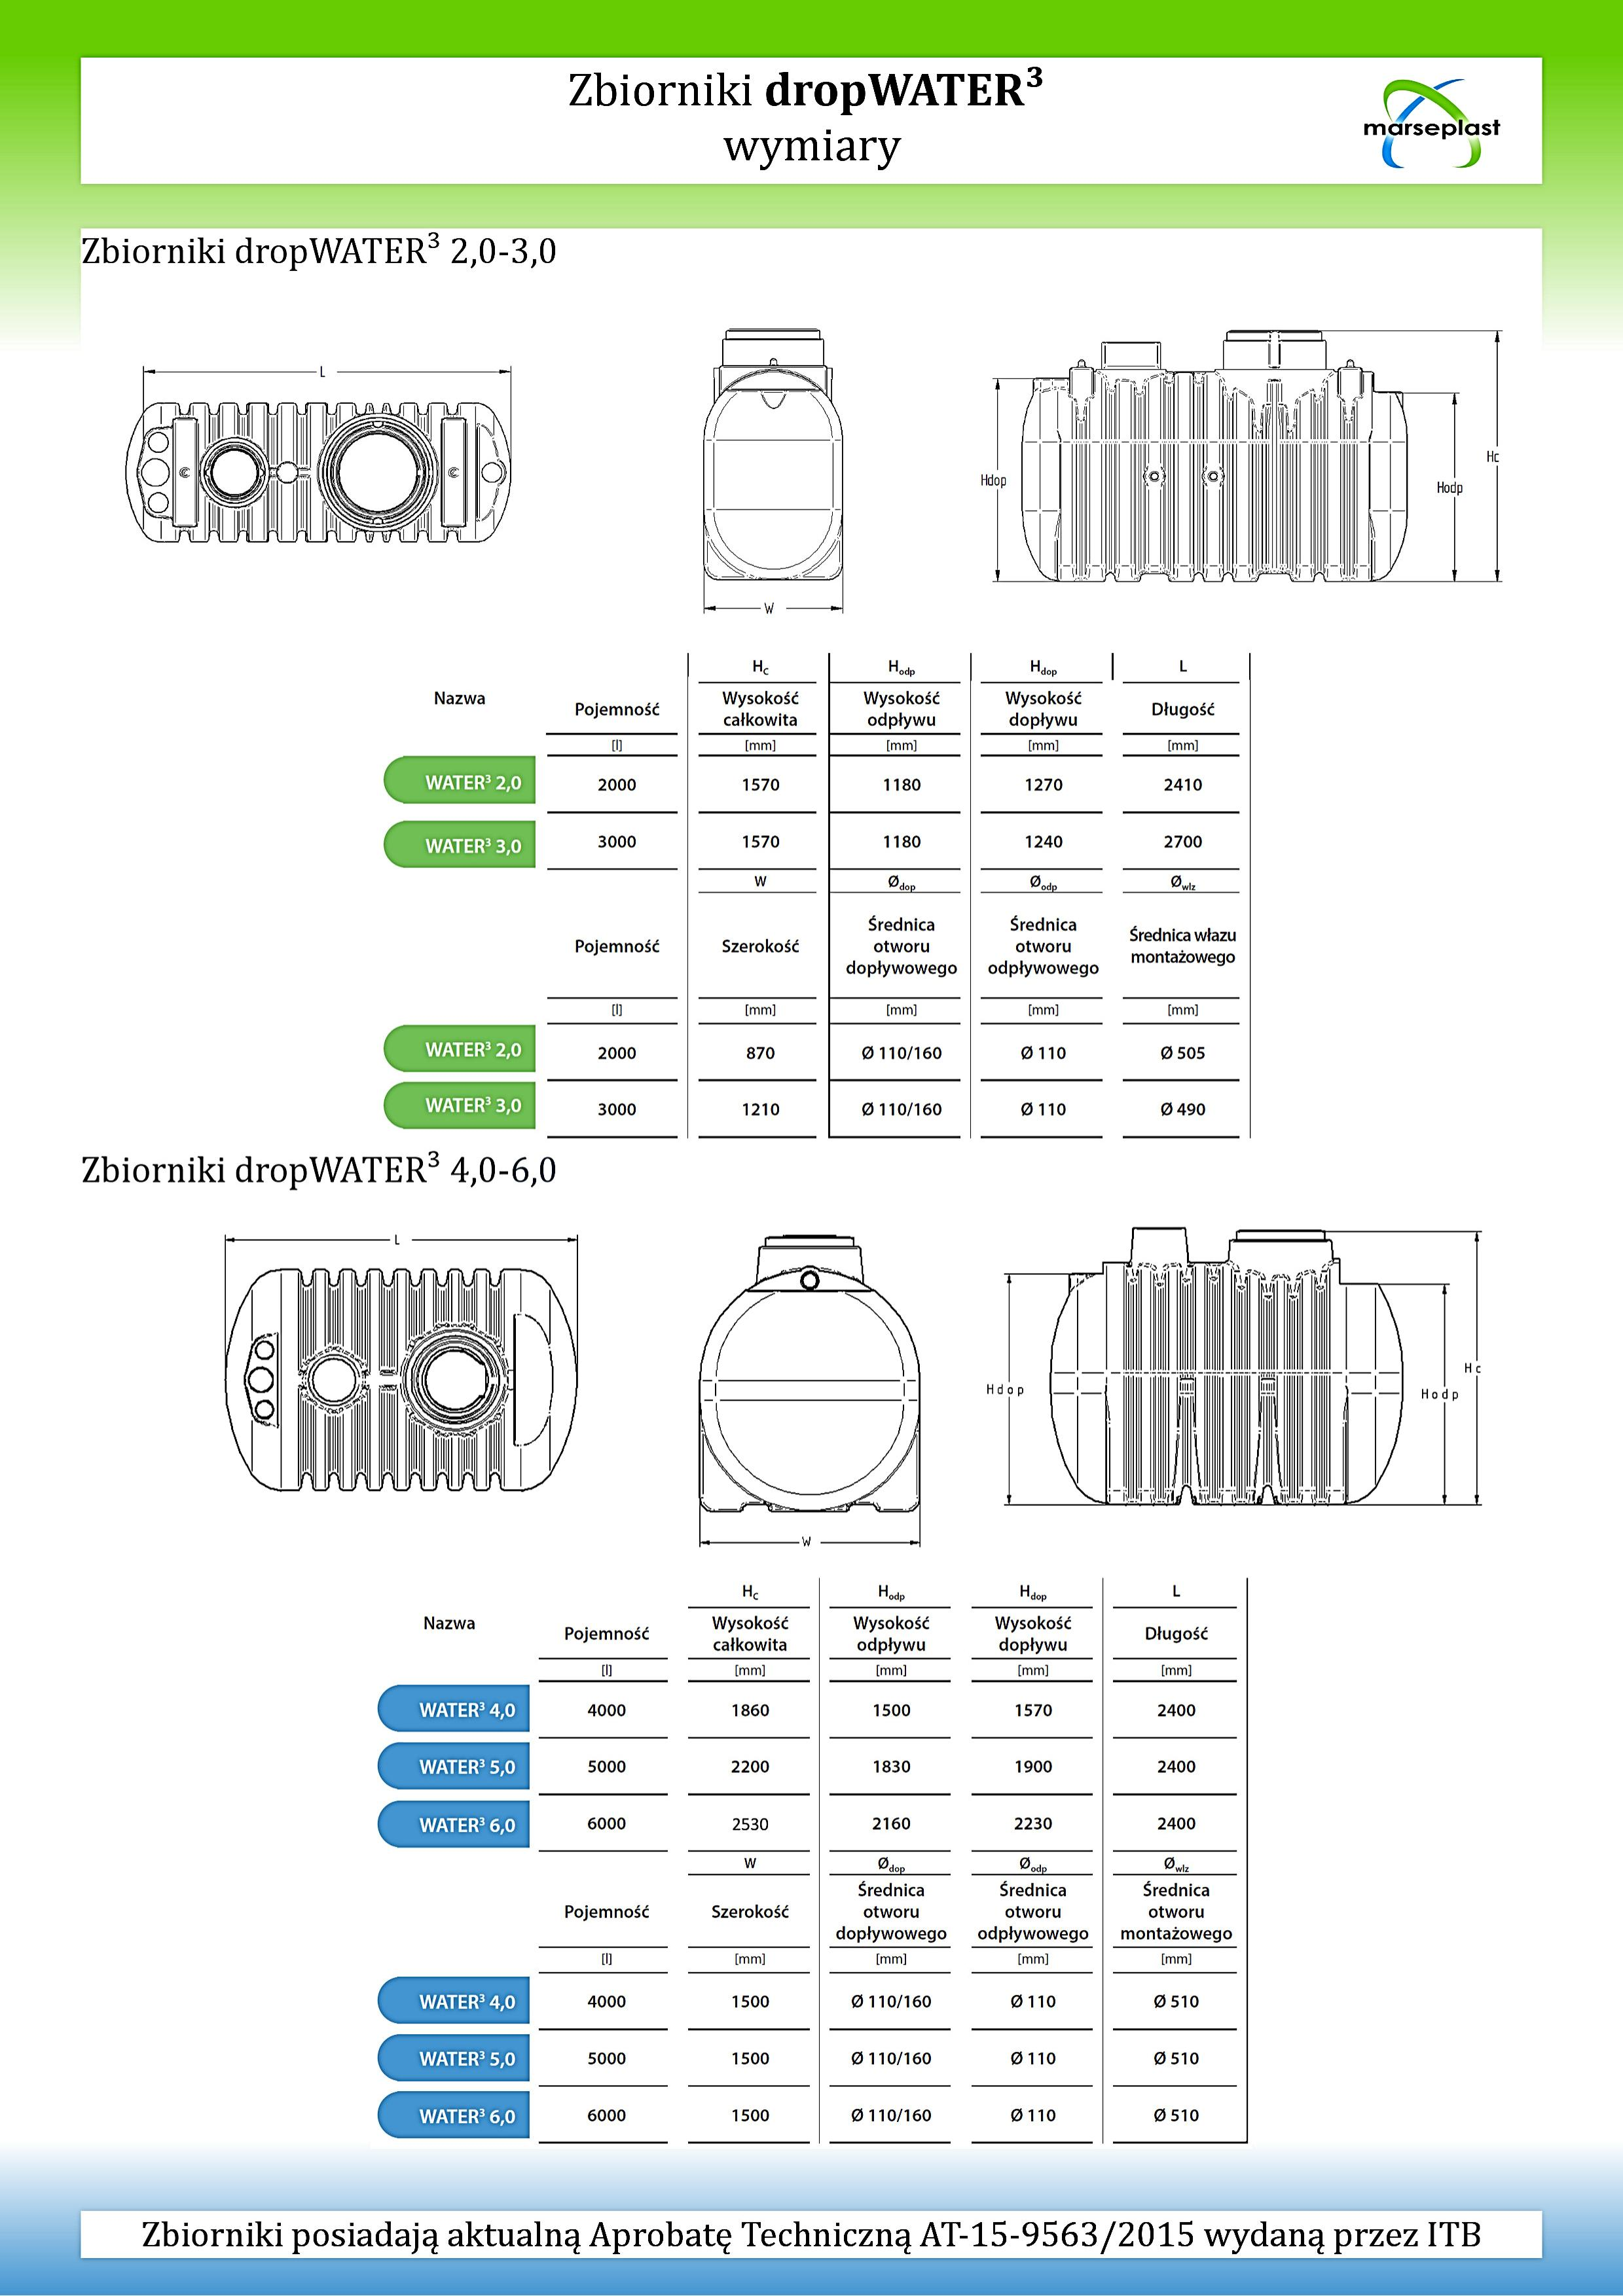 kk dropWATER3 2,0-6,0-page-002